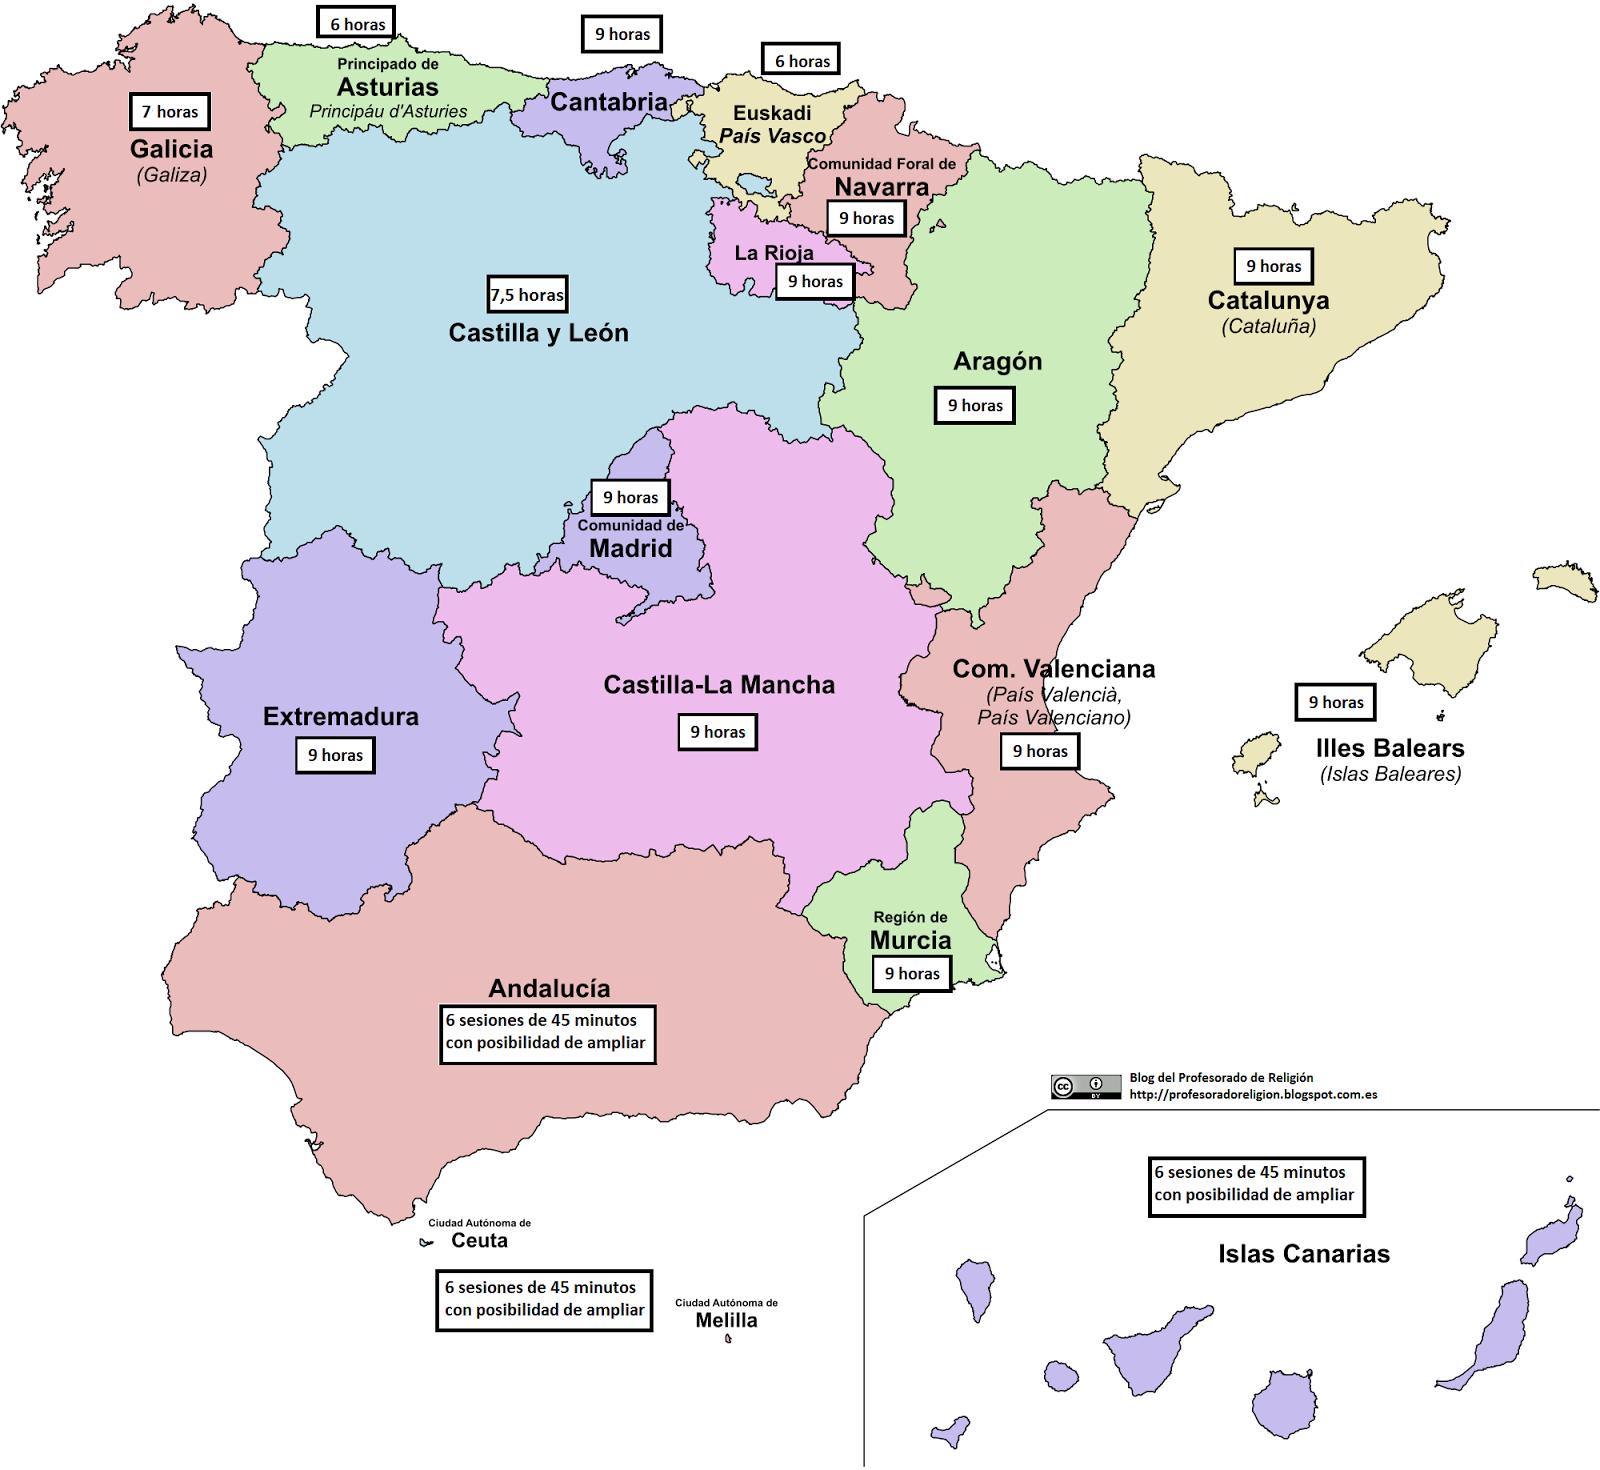 HORARIO RELIGIÓN LOMCE EN PRIMARIA. POR COMUNIDADES